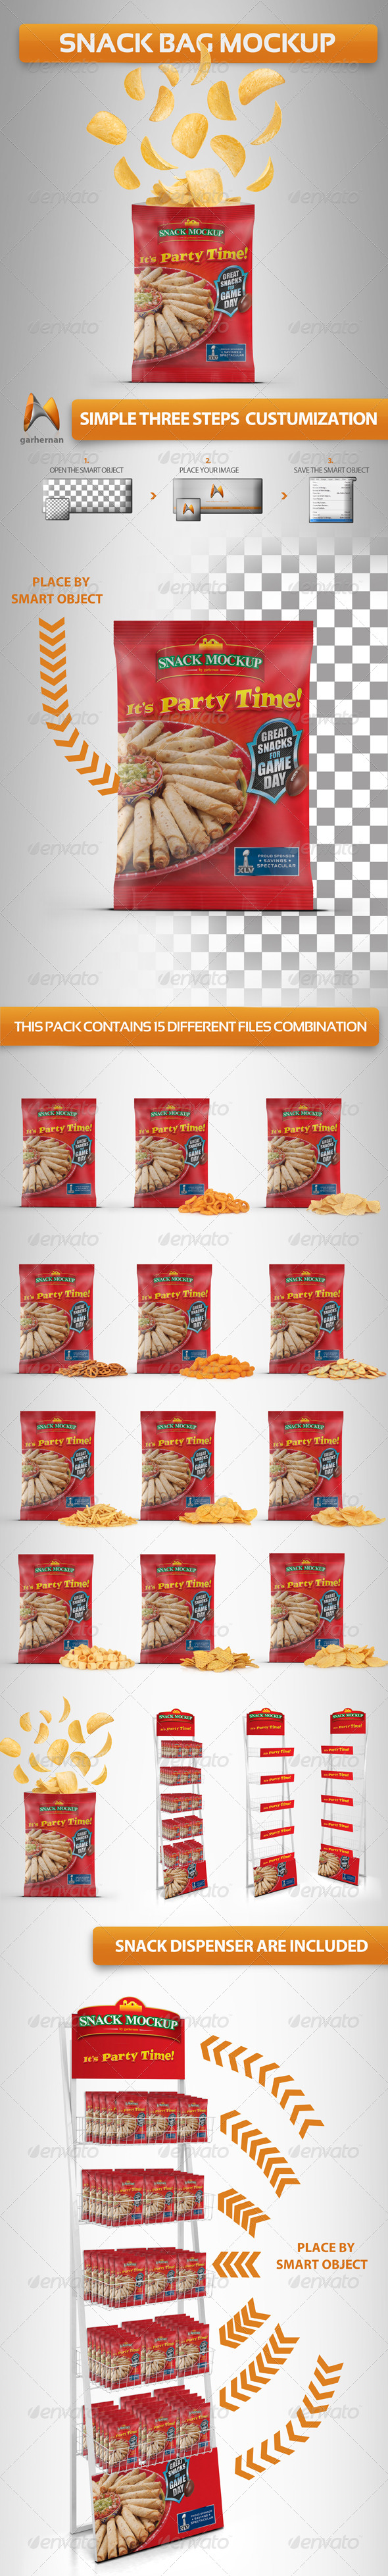 GraphicRiver Snack Bag Mockup 4558761